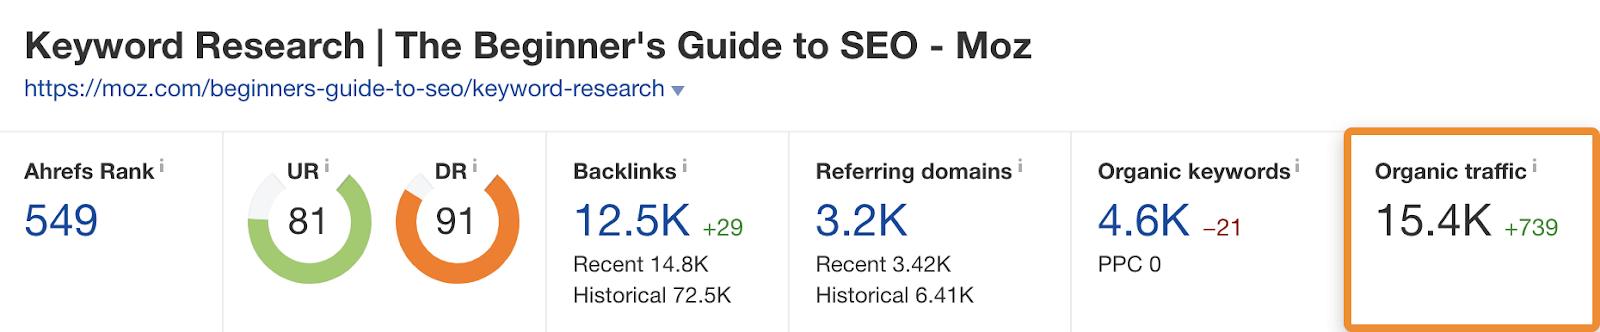 21 keyword research top ranking traffic